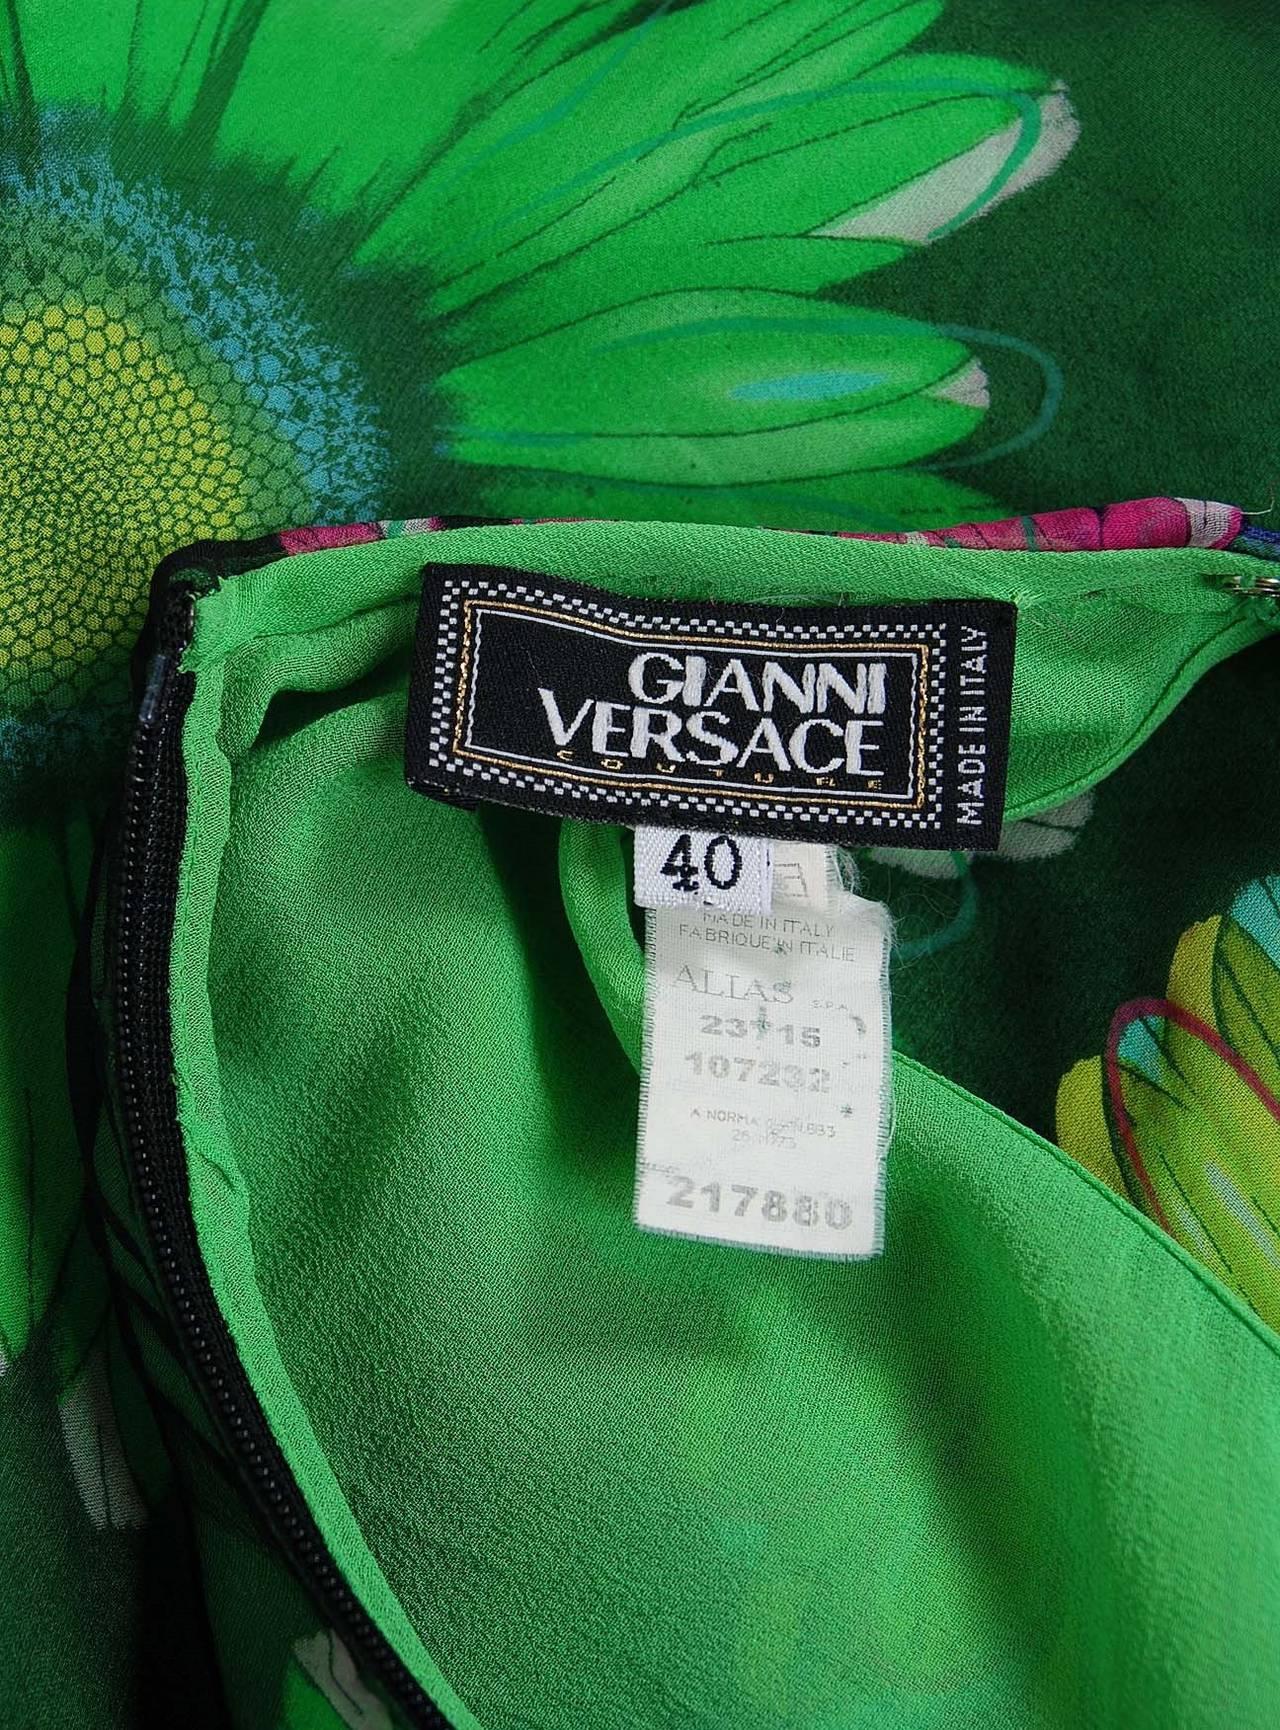 1990's Gianni Versace Couture Sunflower Floral Chiffon Bias-Cut Fishtail Dress For Sale 1